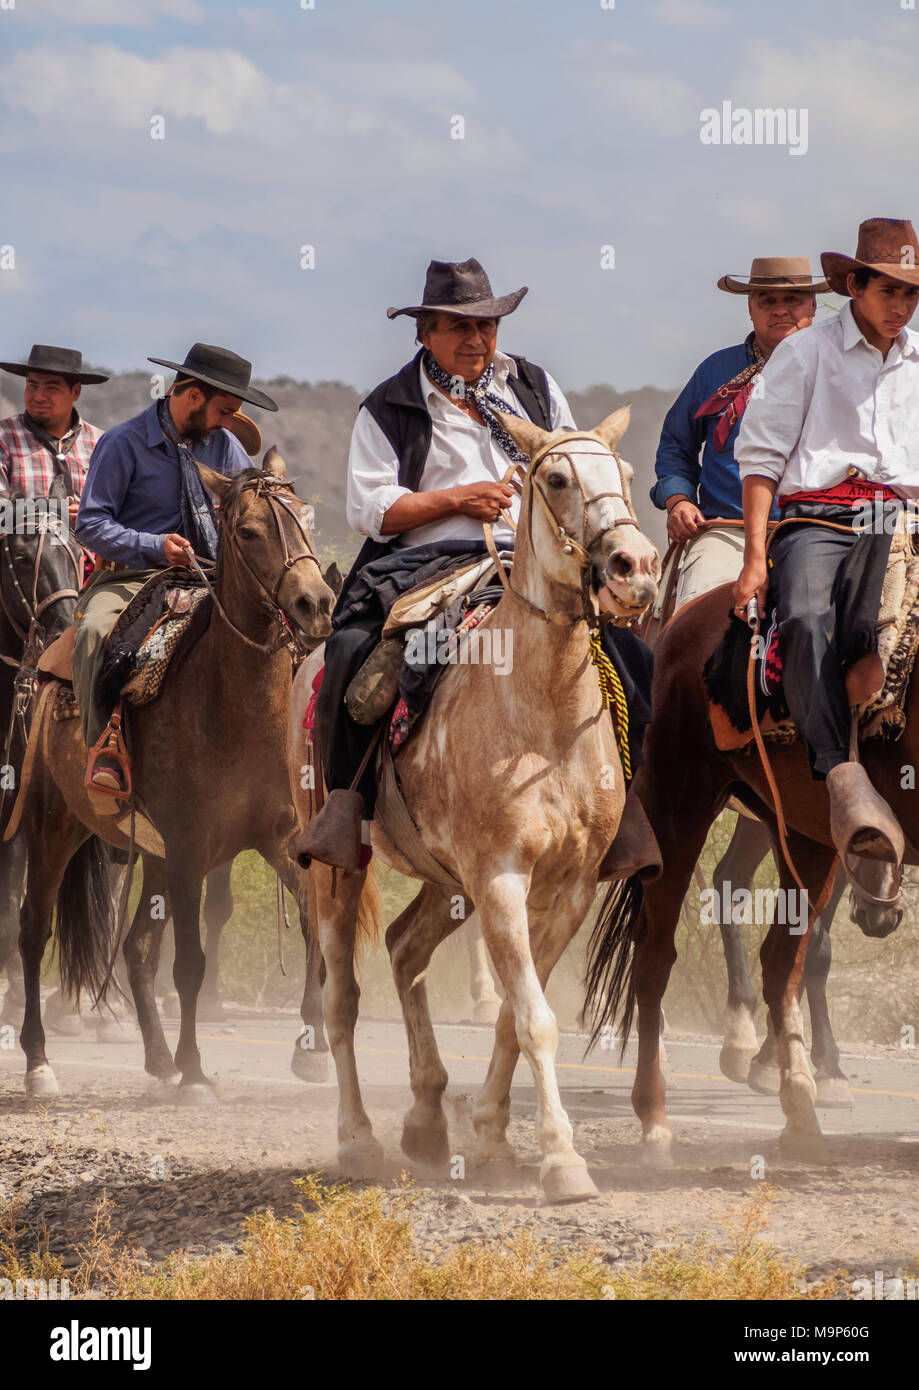 Cabalgata de Los Gauchos, Gaucho horse parade from San Juan to Vallecito, San Juan Province, Argentina - Stock Image